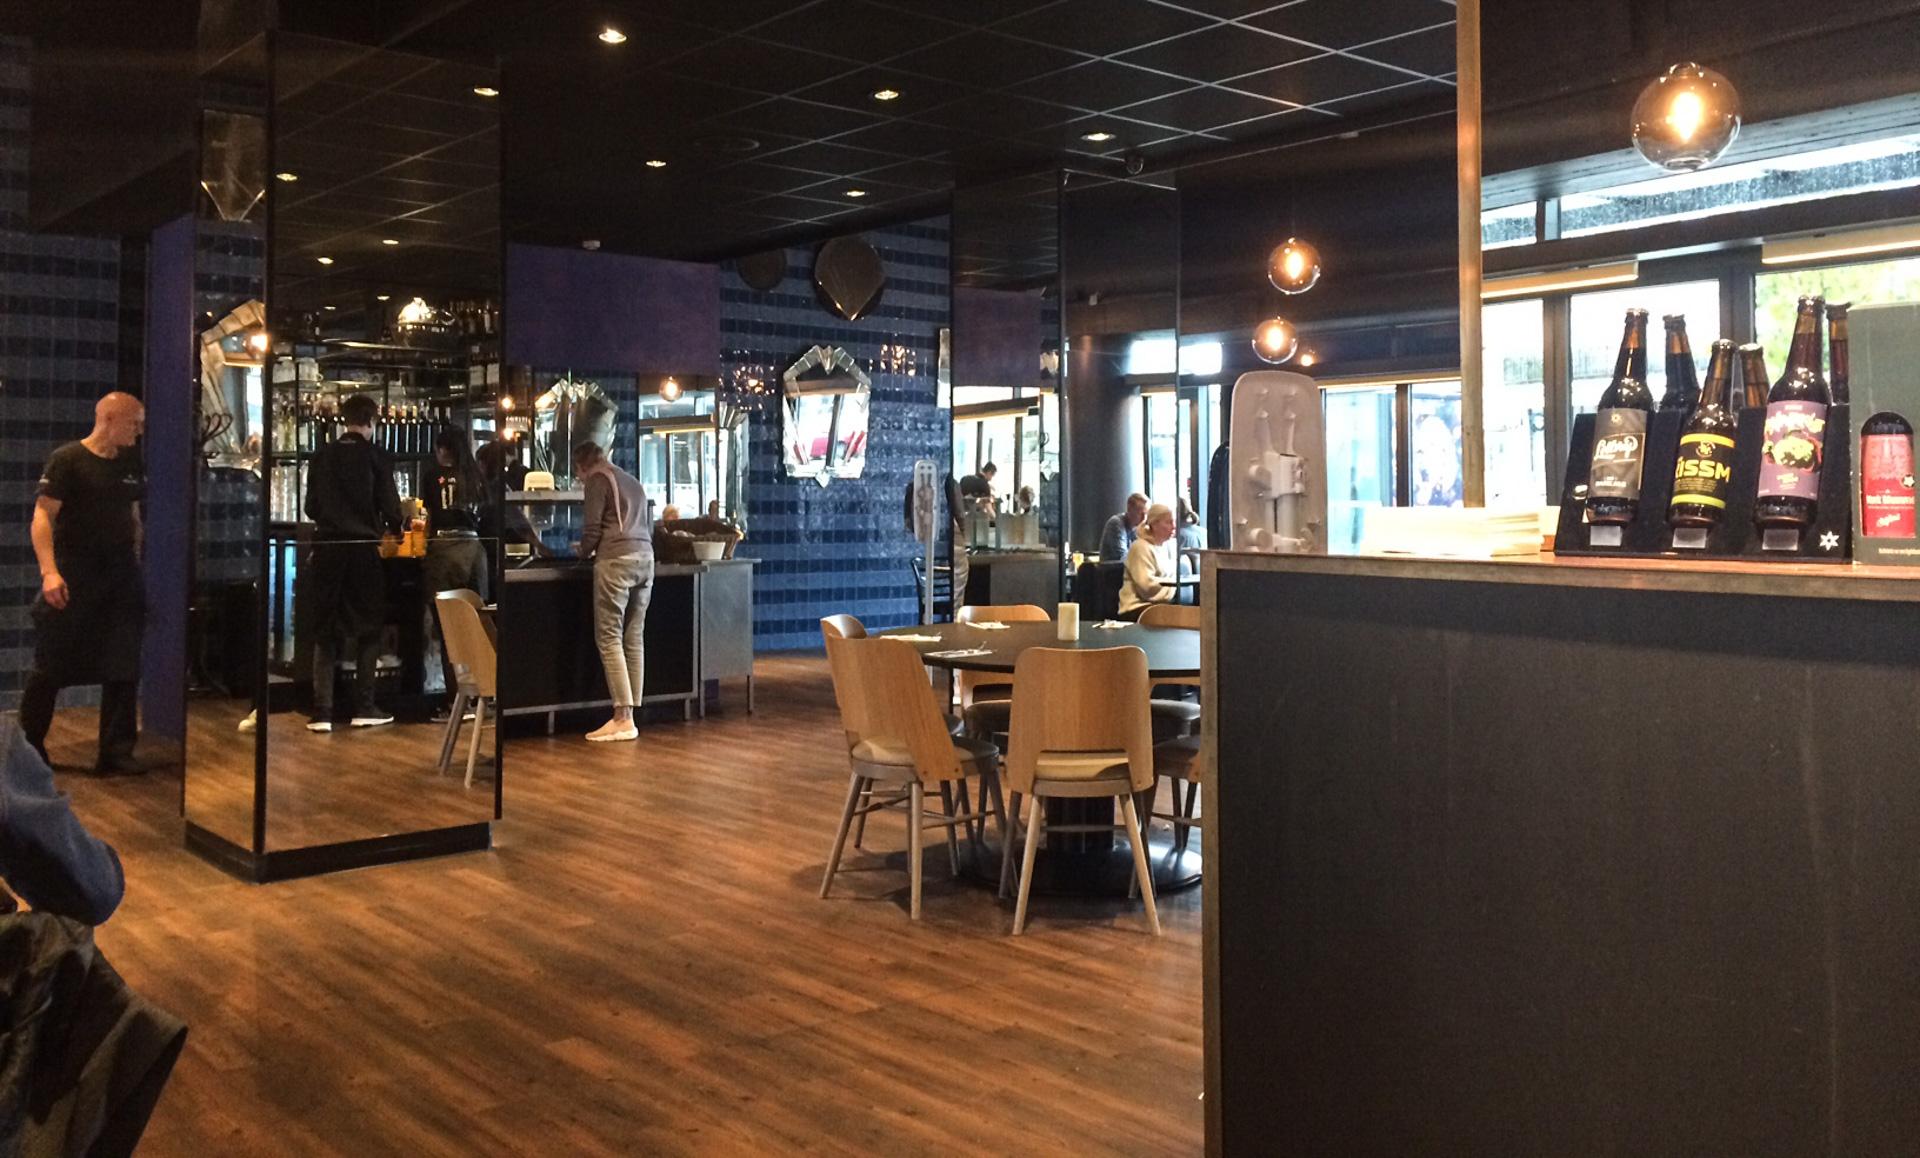 Madanmeldelse: Gode takter og lave priser på ny stor lavpris-café